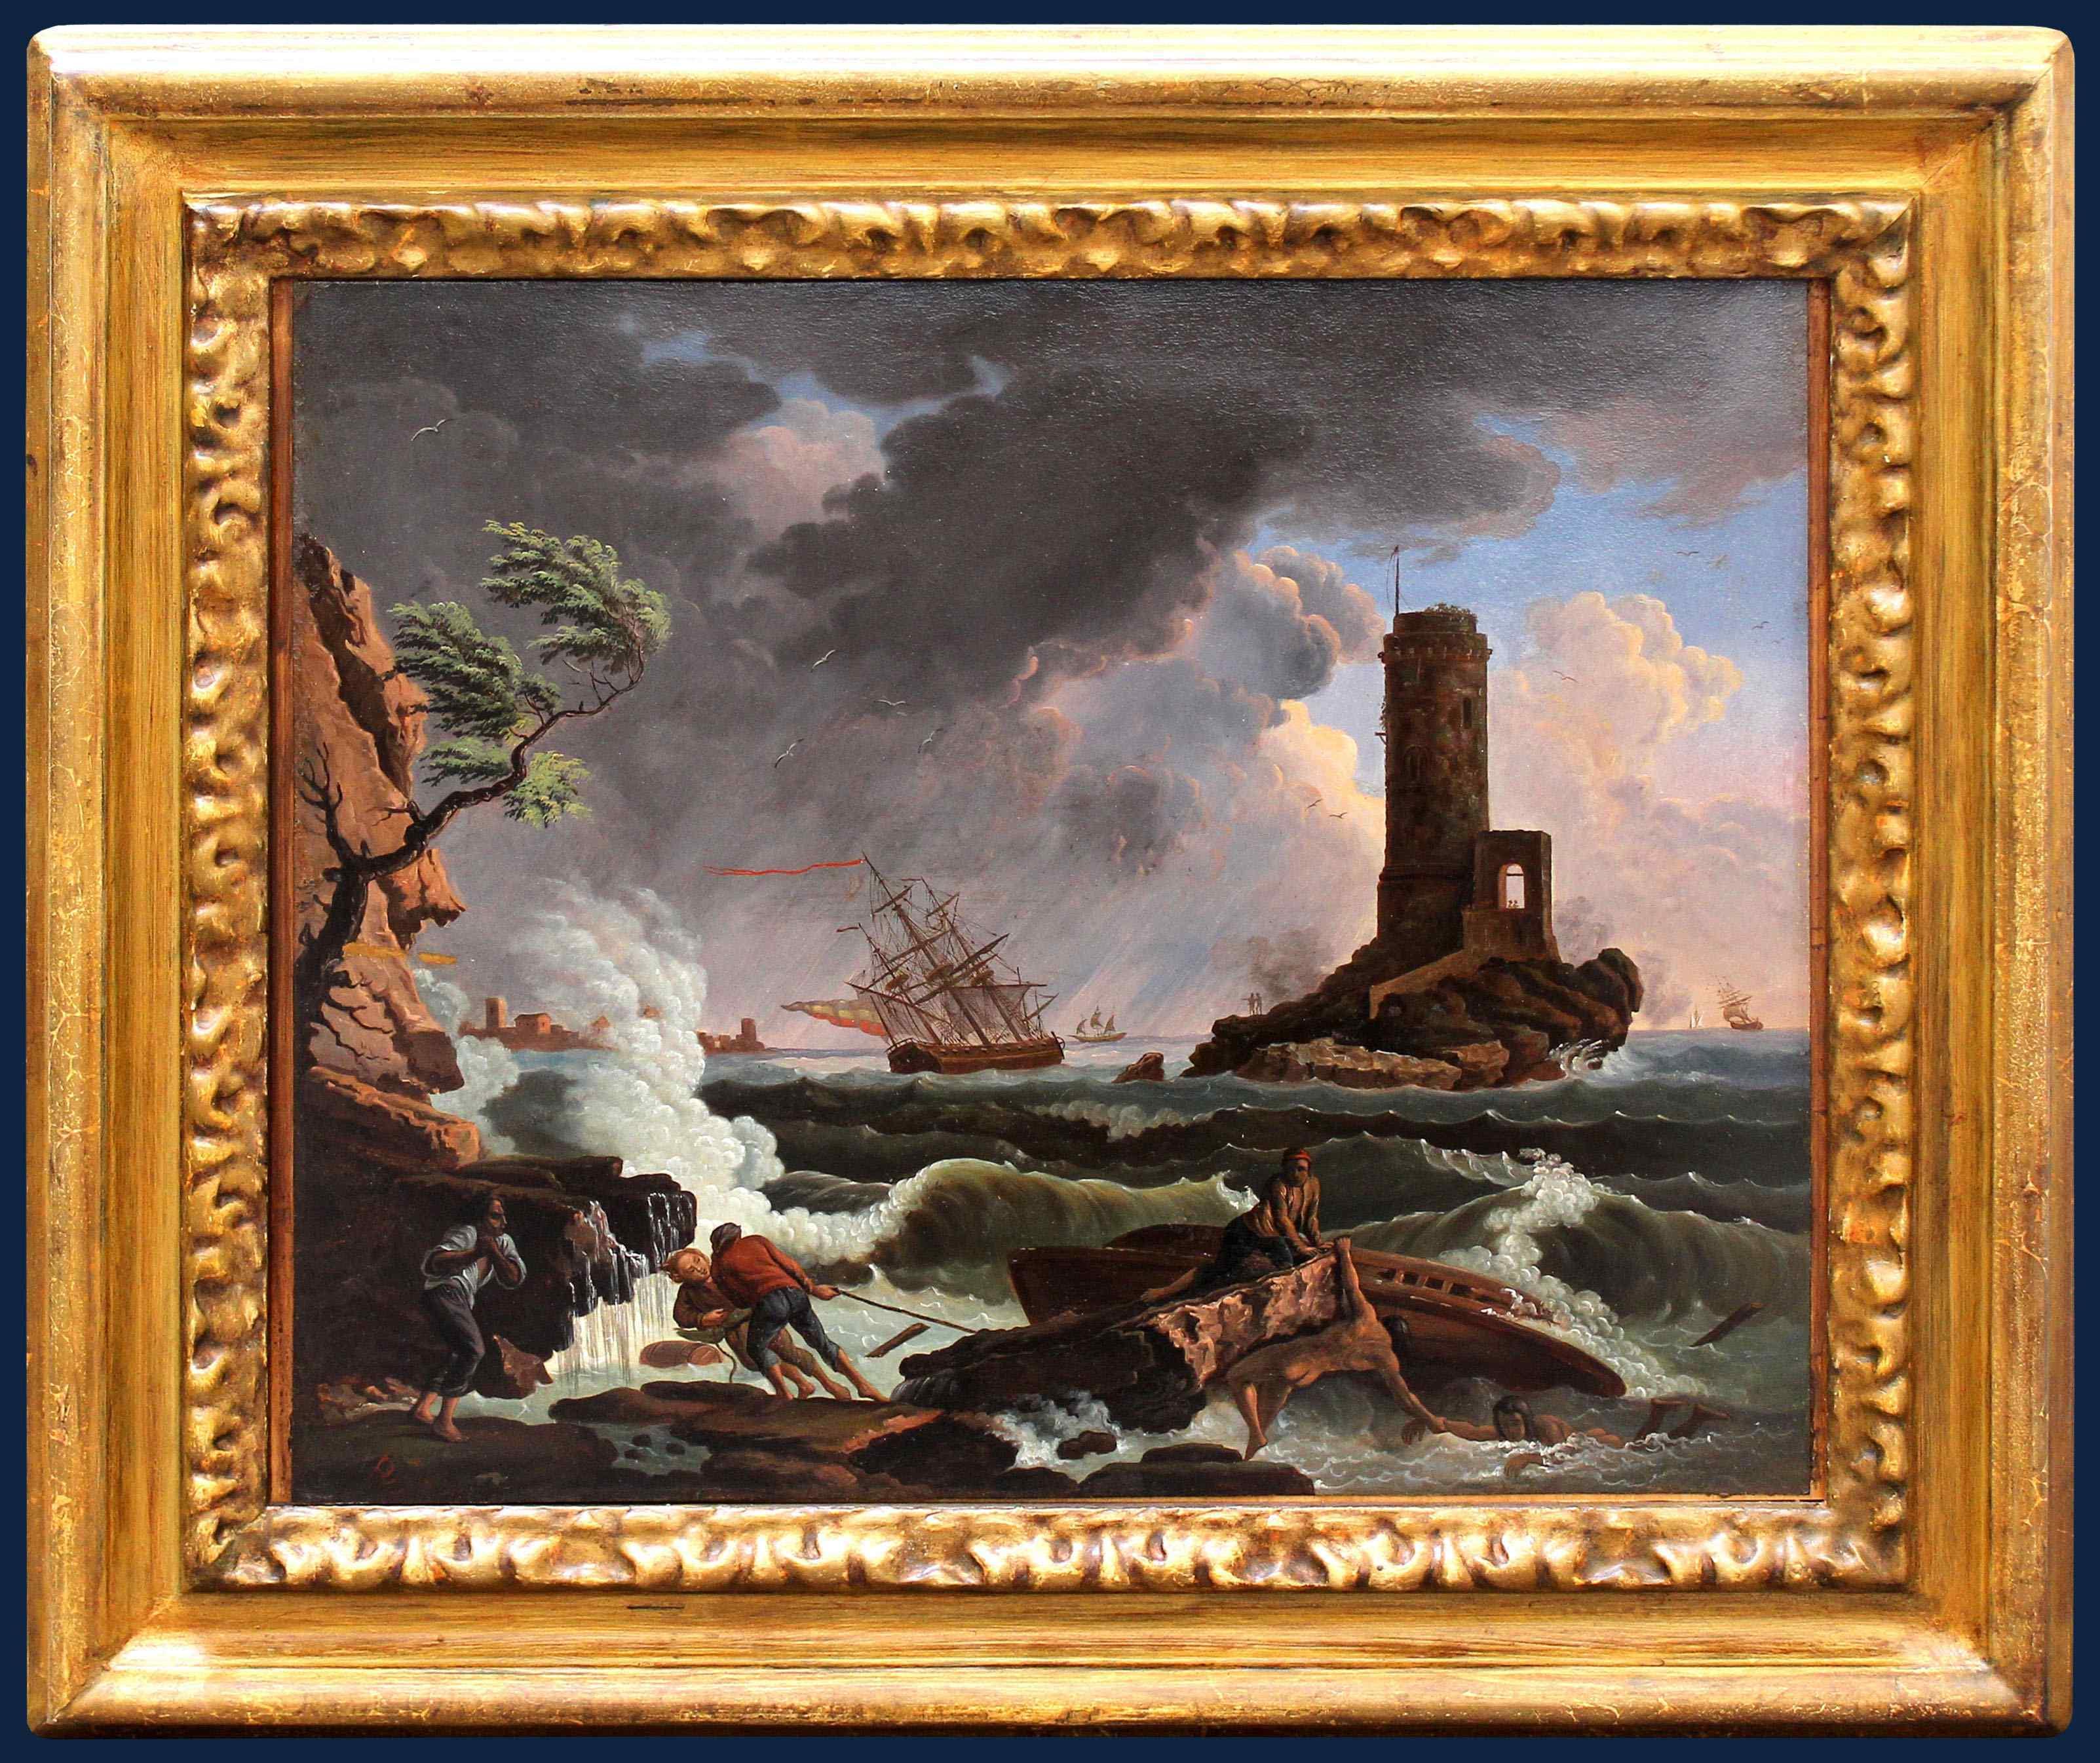 Maniera di Claude Joseph Vernet, Burrasca